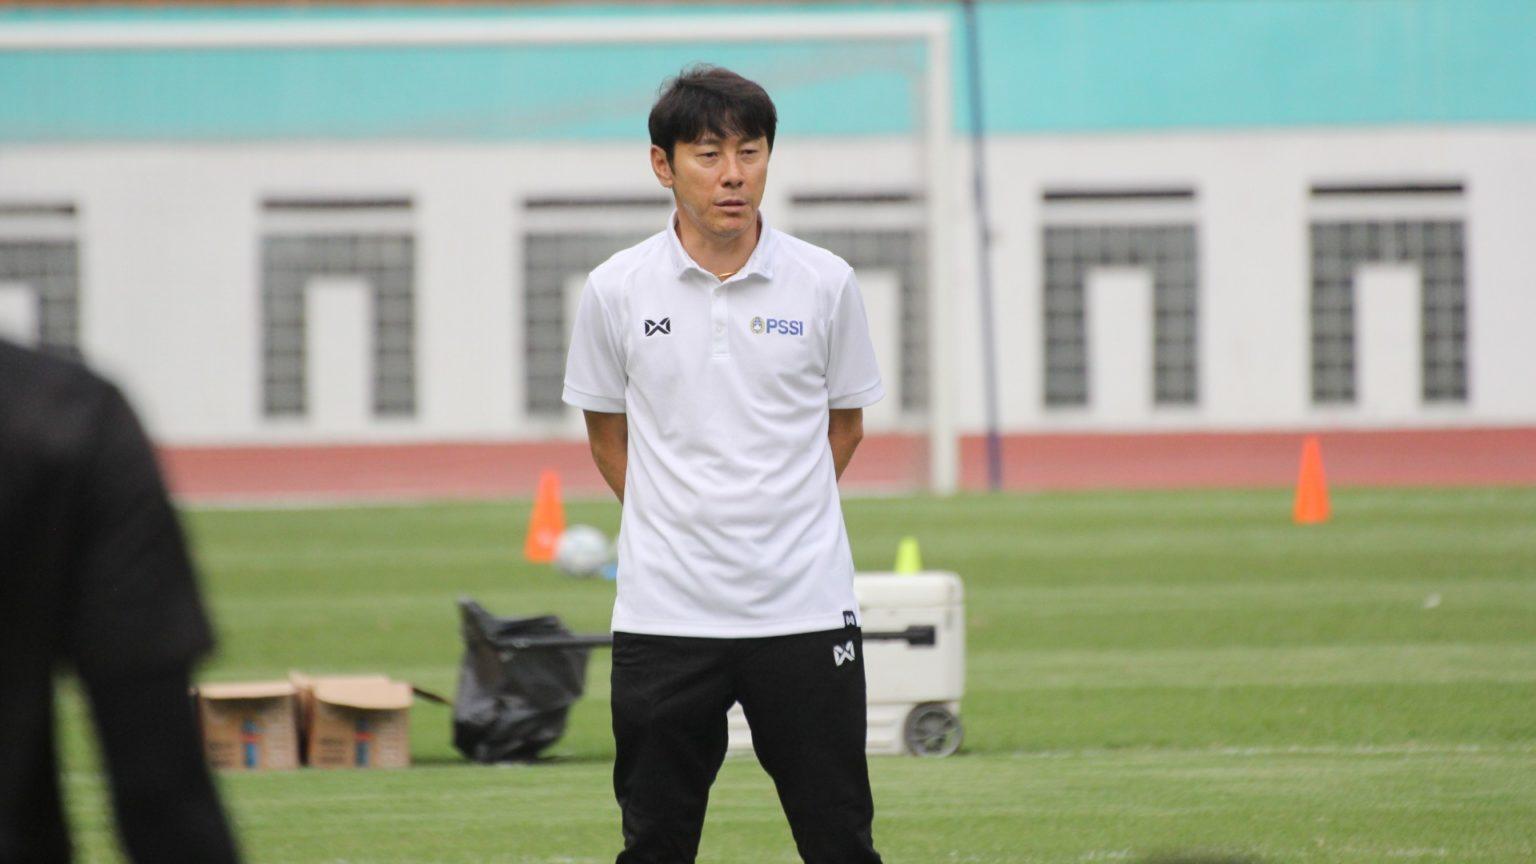 Rencana Shin Tae-yong buat Timnas Indonesia Sampai Akhir Tahun 2020